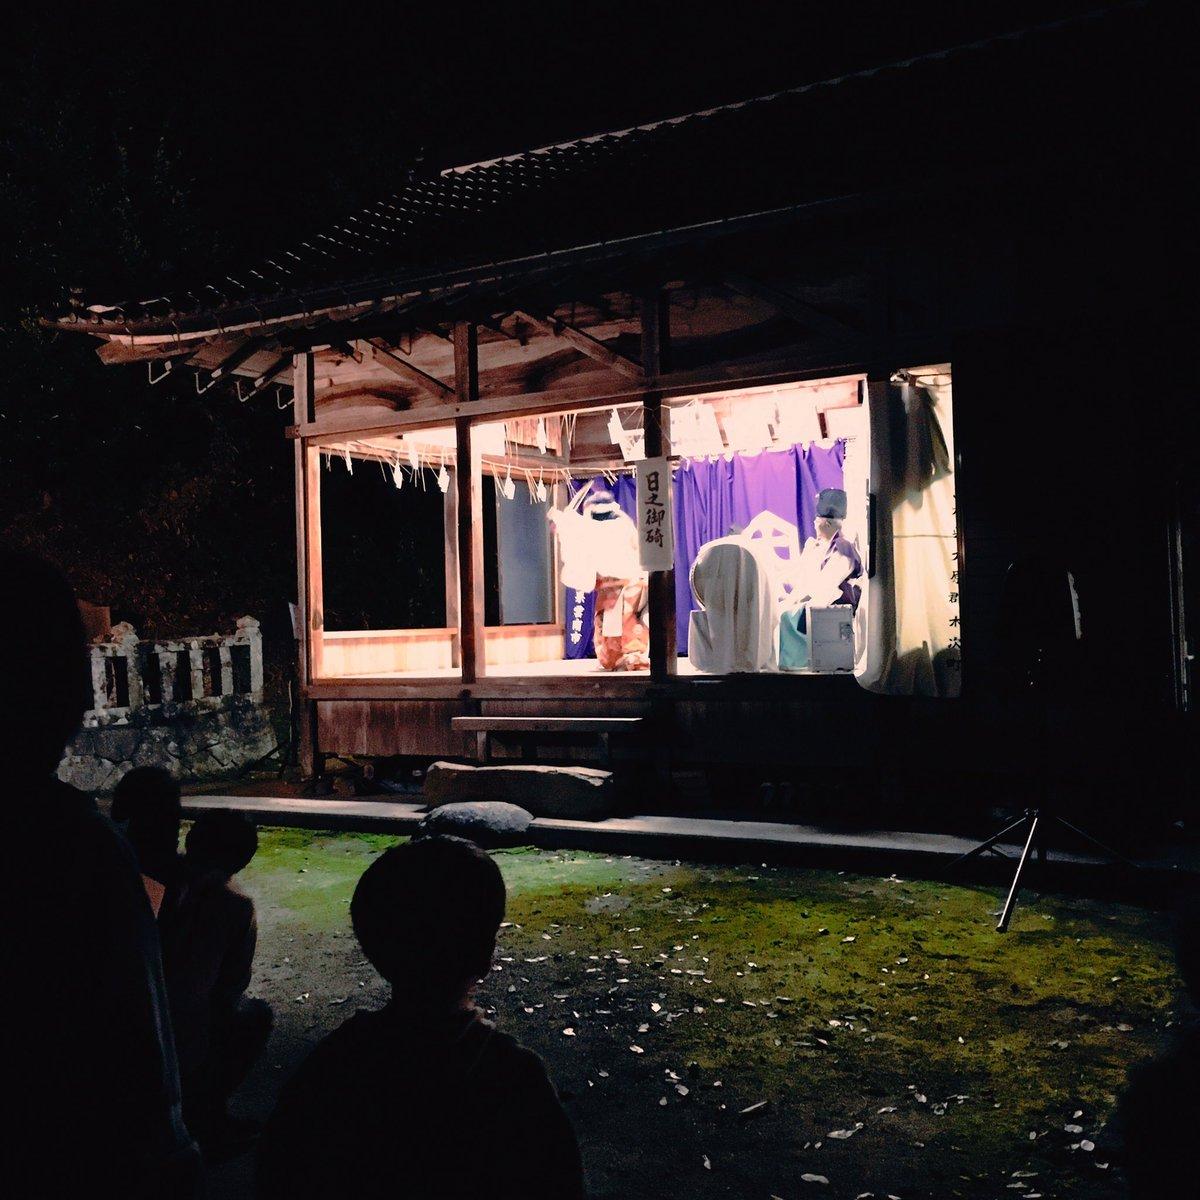 test ツイッターメディア - 本日は氏神様の神社で秋祭り🍁 御神楽を見て、帰り道には焼きたての栗まんじゅうを食べて🌰  今年も良い秋を迎えました🦌🌖 https://t.co/VpGXN33RZ9